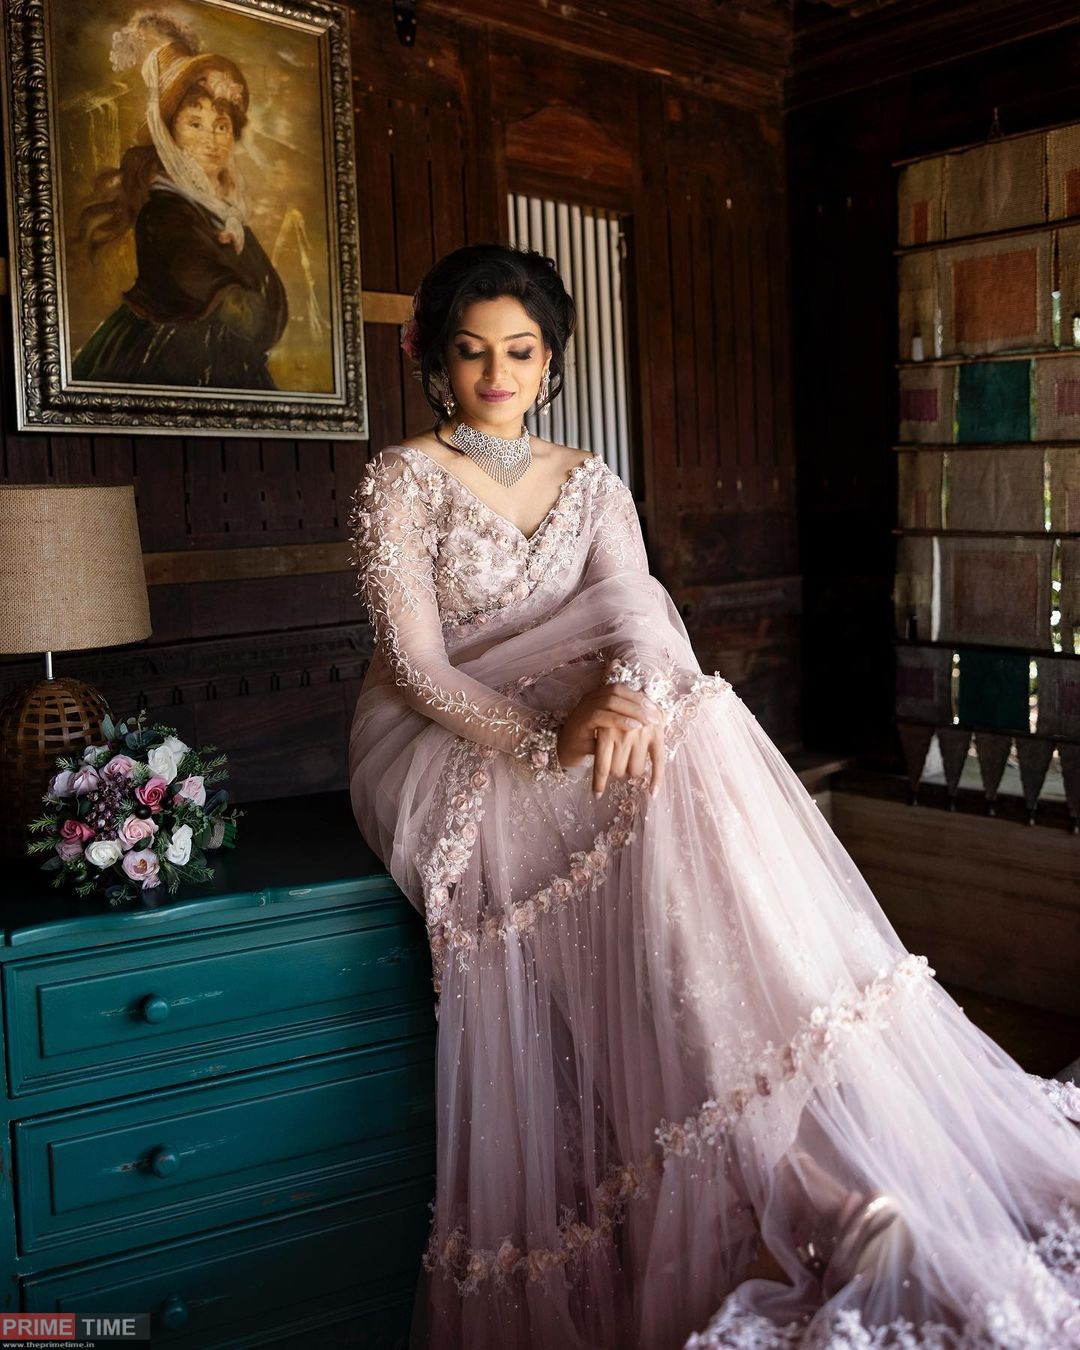 Divya has arrived as a Christian bride